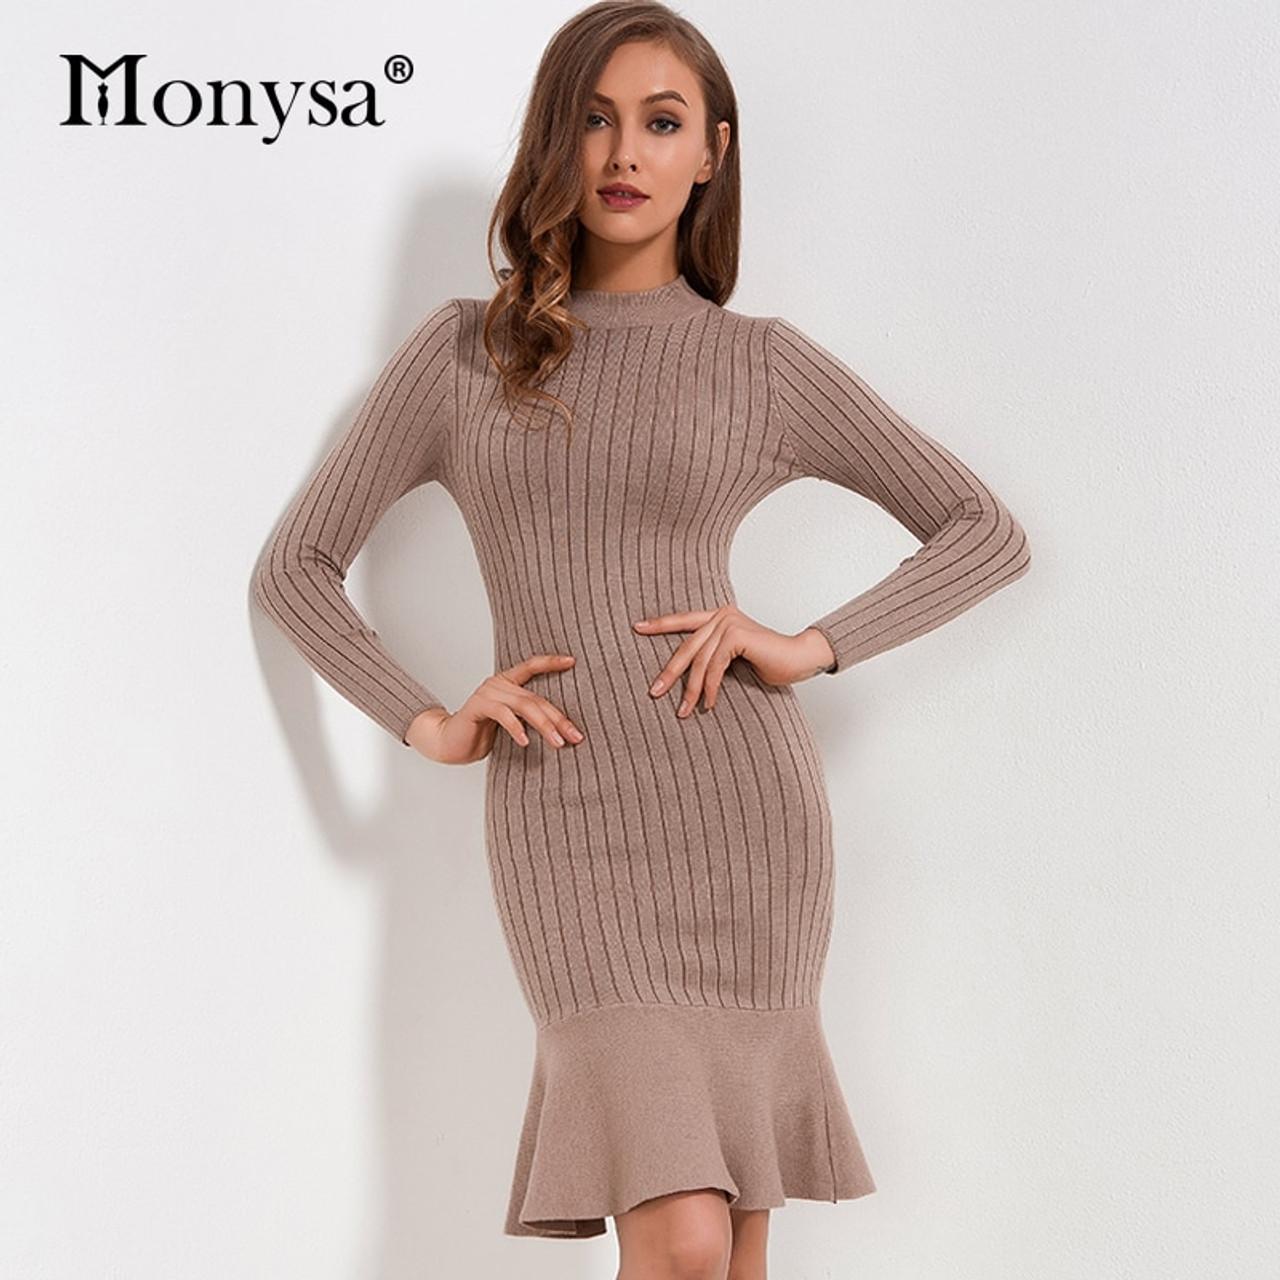 Ruffle Sweater Dress Autumn Winter 2018 New Arrivals Long Sleeve Bodycon  Dresses Ladies Knee Length Knitted Sweater Dress Women - OnshopDeals.Com 882b16efab44